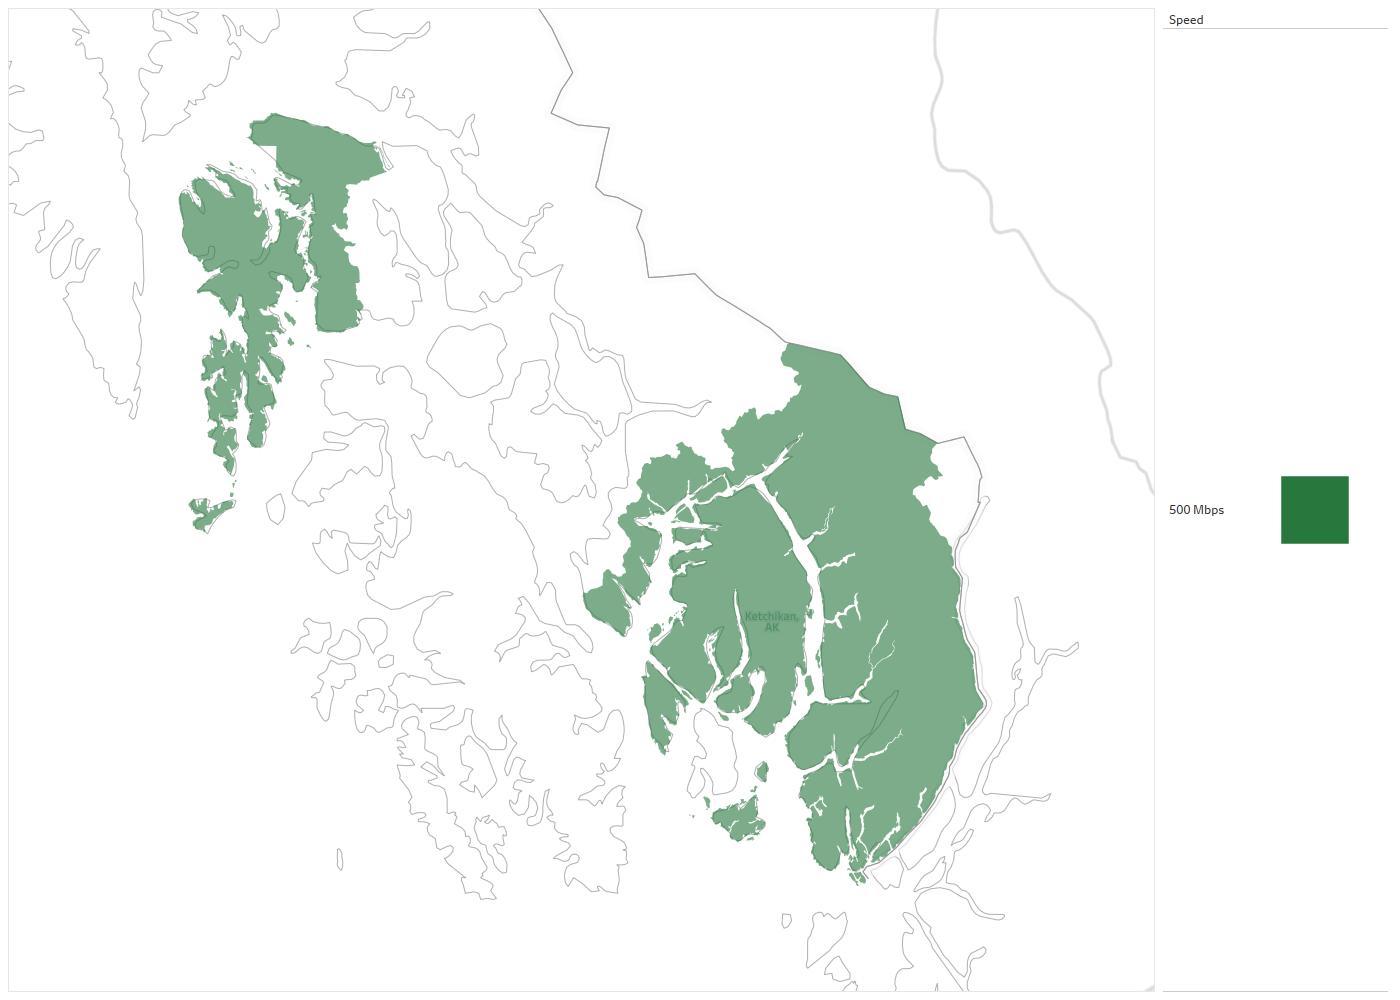 Ketchikan Public Utilities Availability Areas & Coverage Map ... on sitka alaska, outline map of alaska, juneau alaska, map of homer alaska, large print map of alaska, map of wasilla alaska, map of southeast alaska, map of naknek alaska, juno alaska, ketchican alaska, skagway alaska, map of seward alaska, map of alaska inside passage, map of kotzebue alaska, map of craig alaska, map of alaska and canada, map of vancouver bc, road map of alaska, map of denali alaska, map of hoonah alaska,